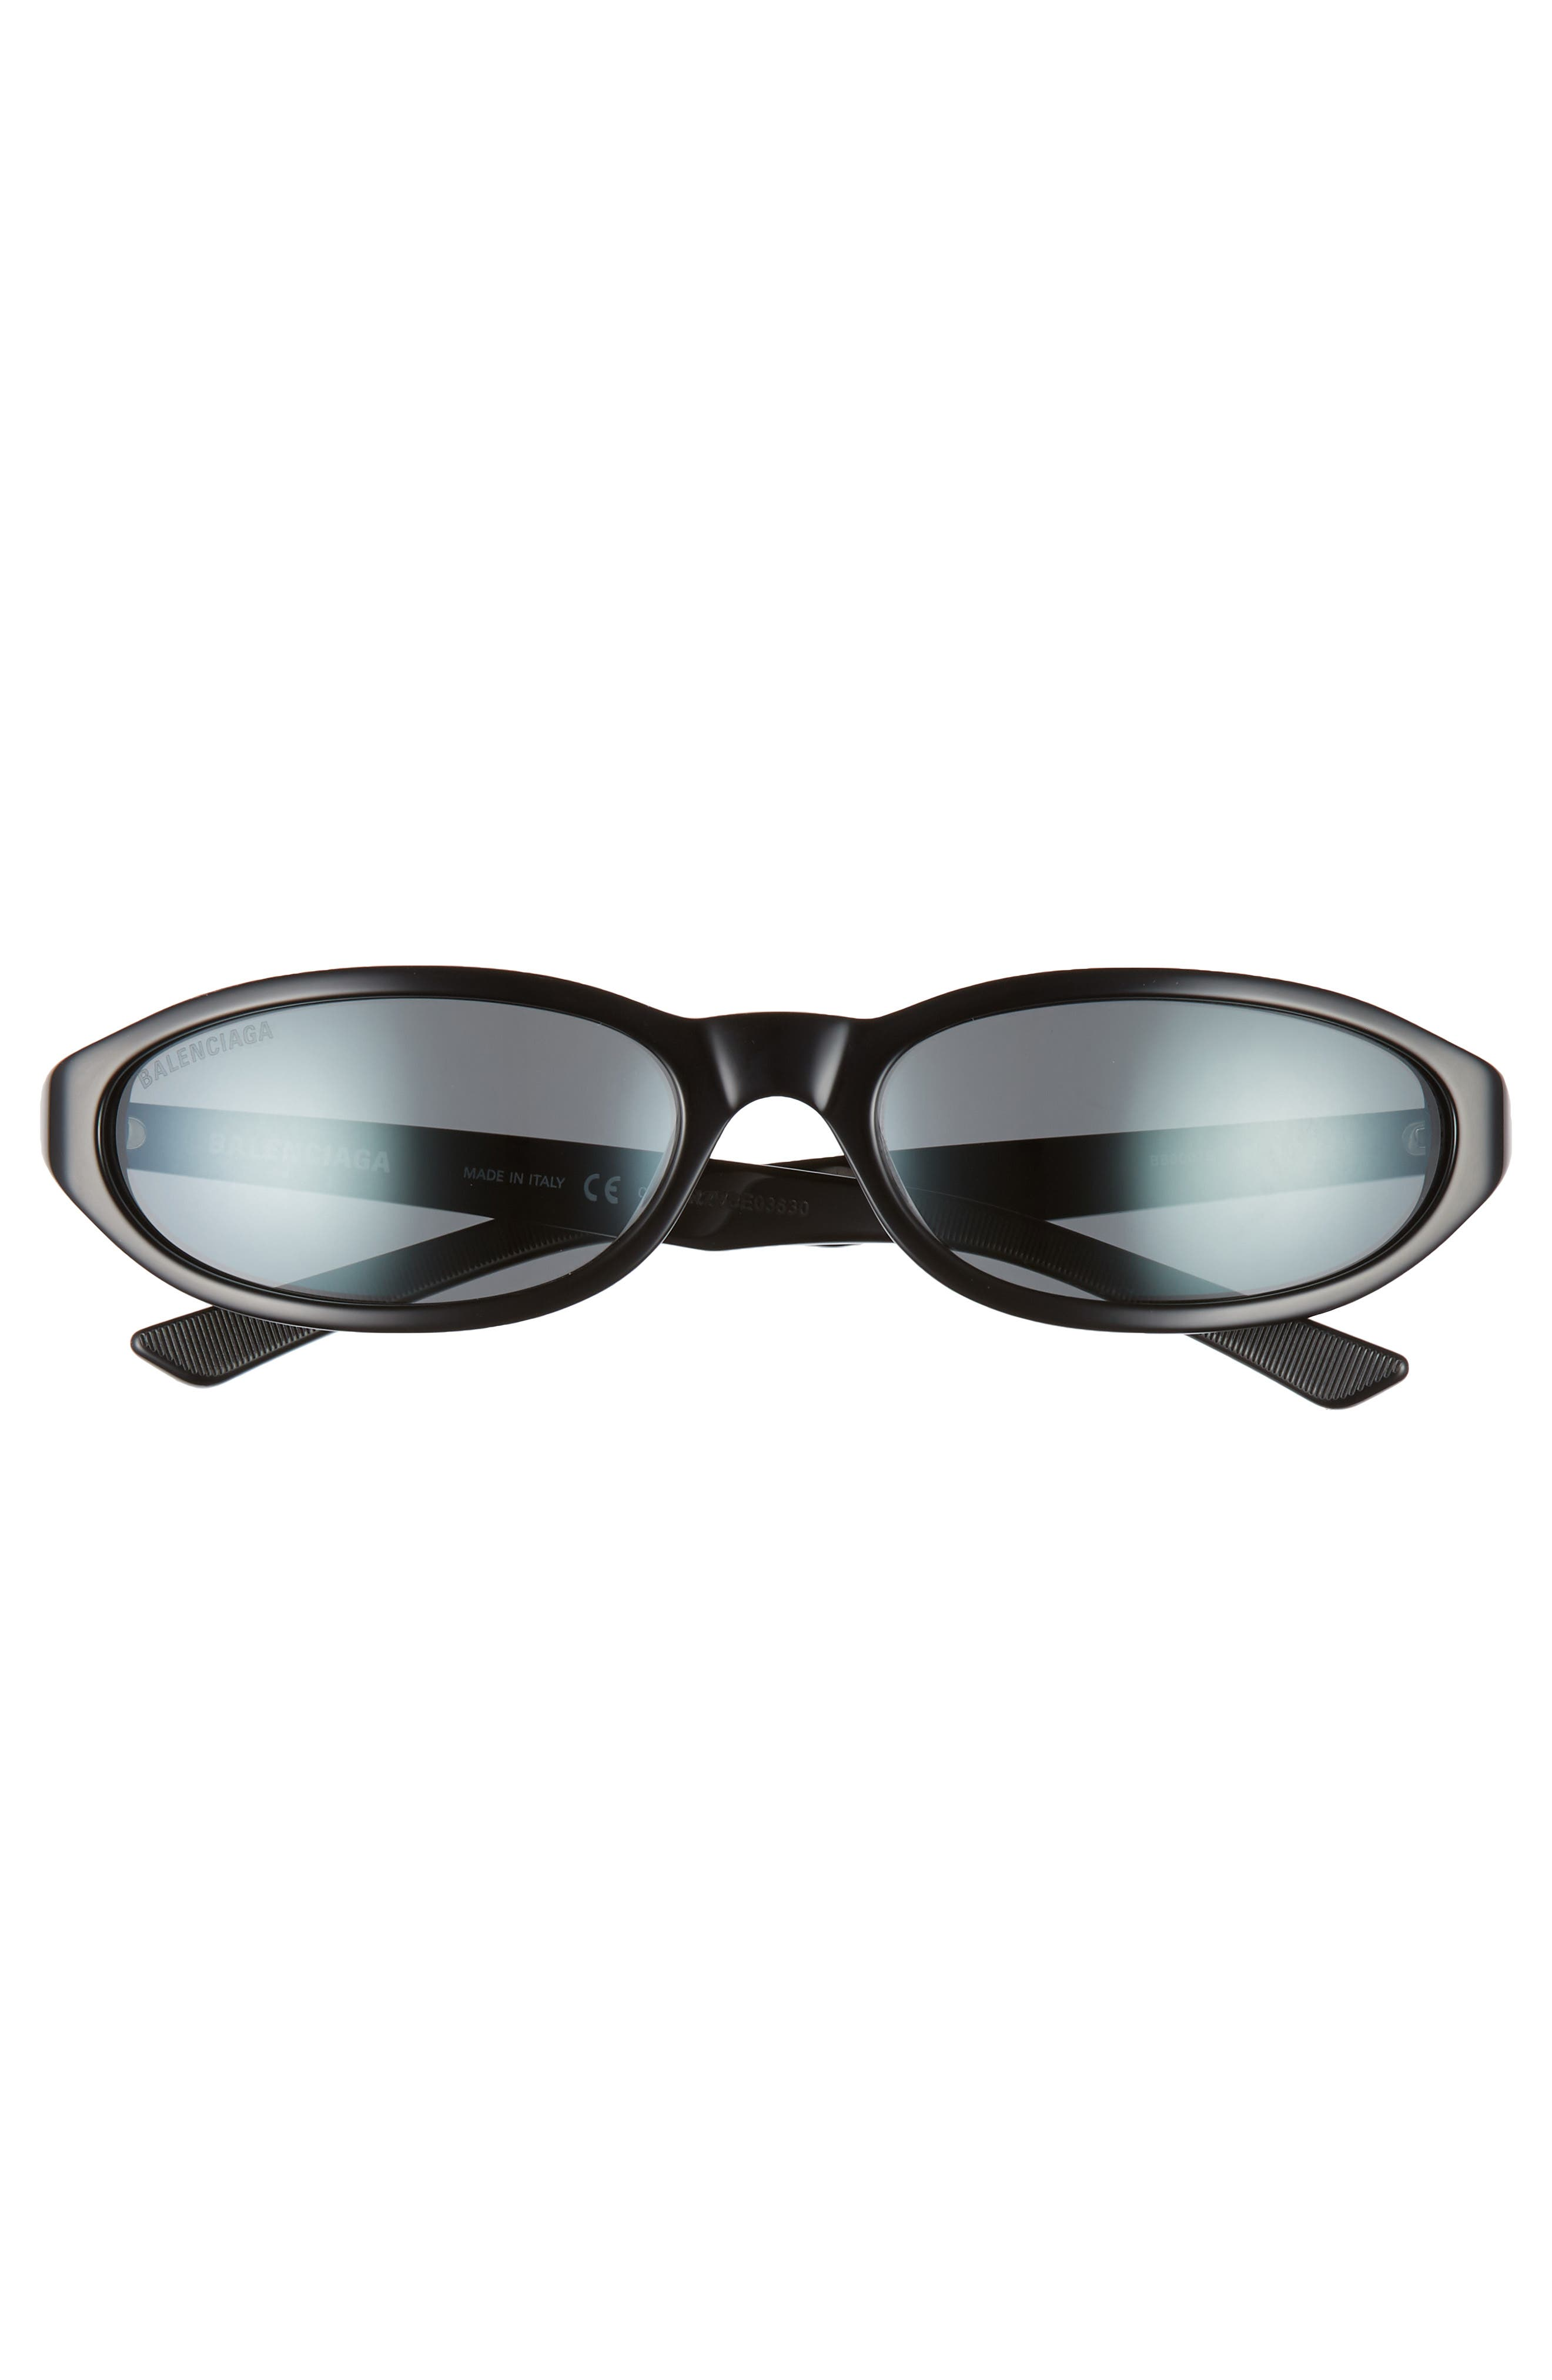 BALENCIAGA, 59mm Cateye Sunglasses, Alternate thumbnail 3, color, SHINY BLACK/ GREY